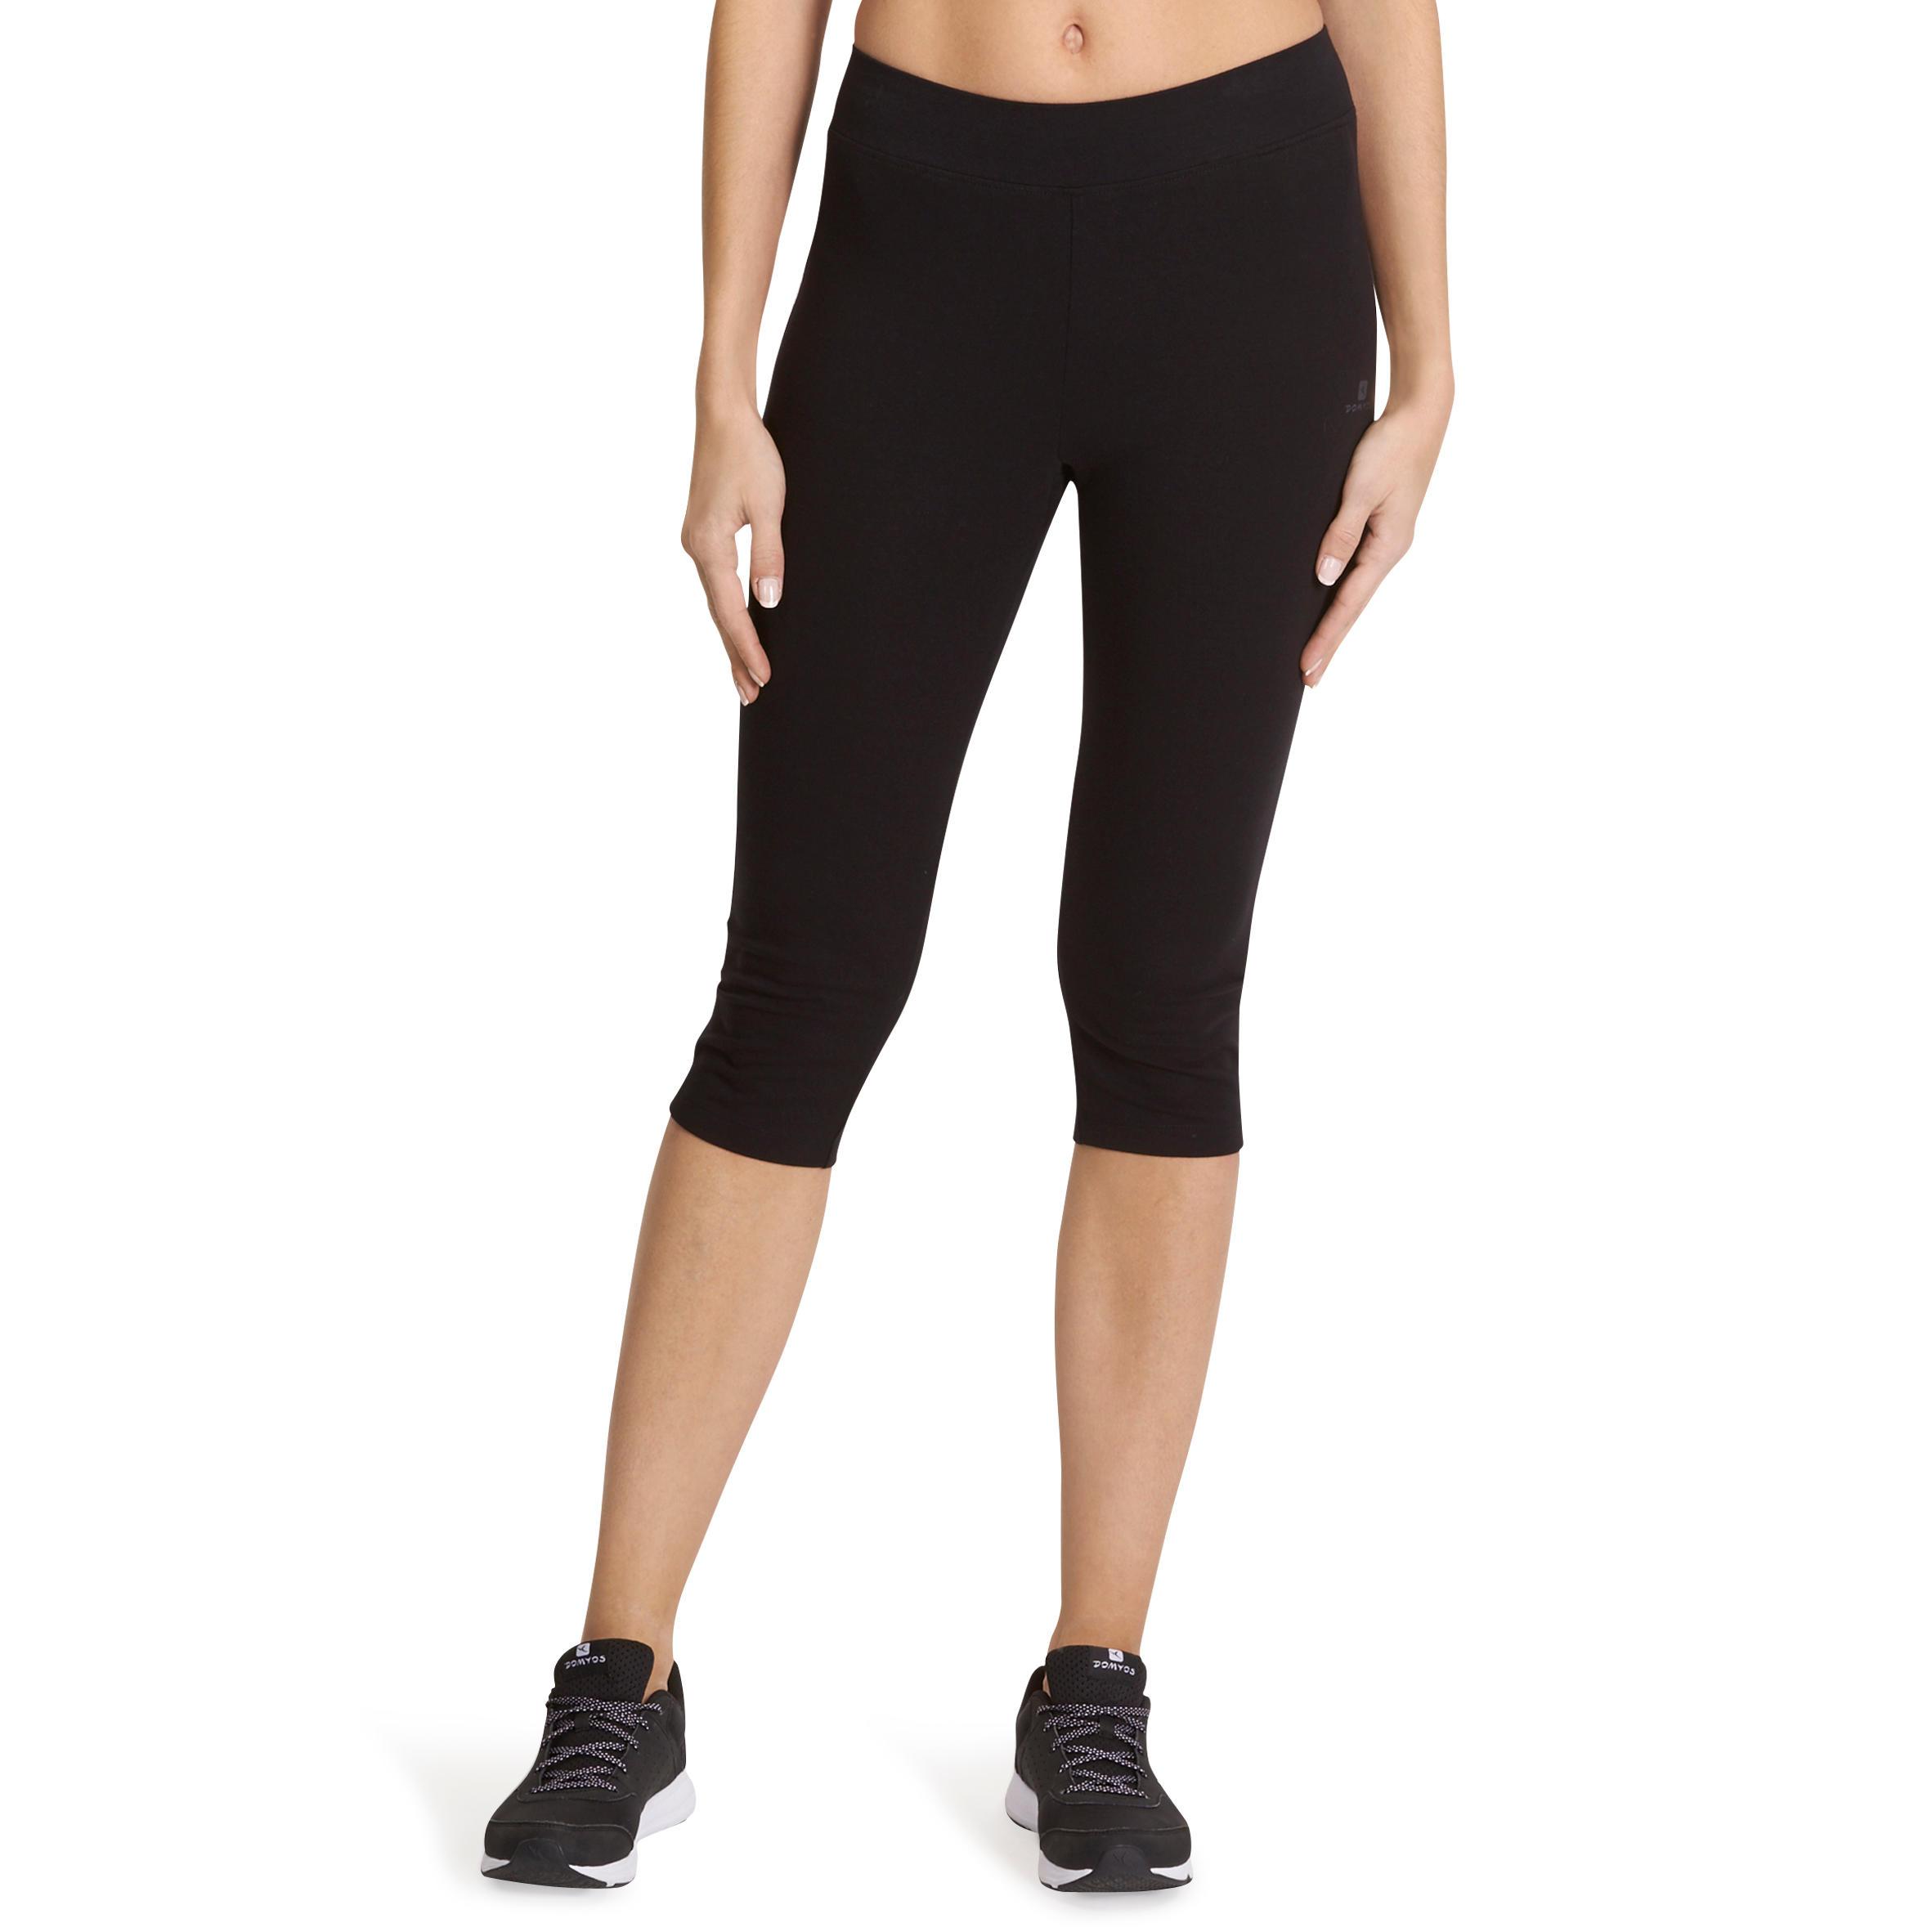 Fit+ 500 Women's Slim-Fit Gym & Pilates Cropped Bottoms - Black